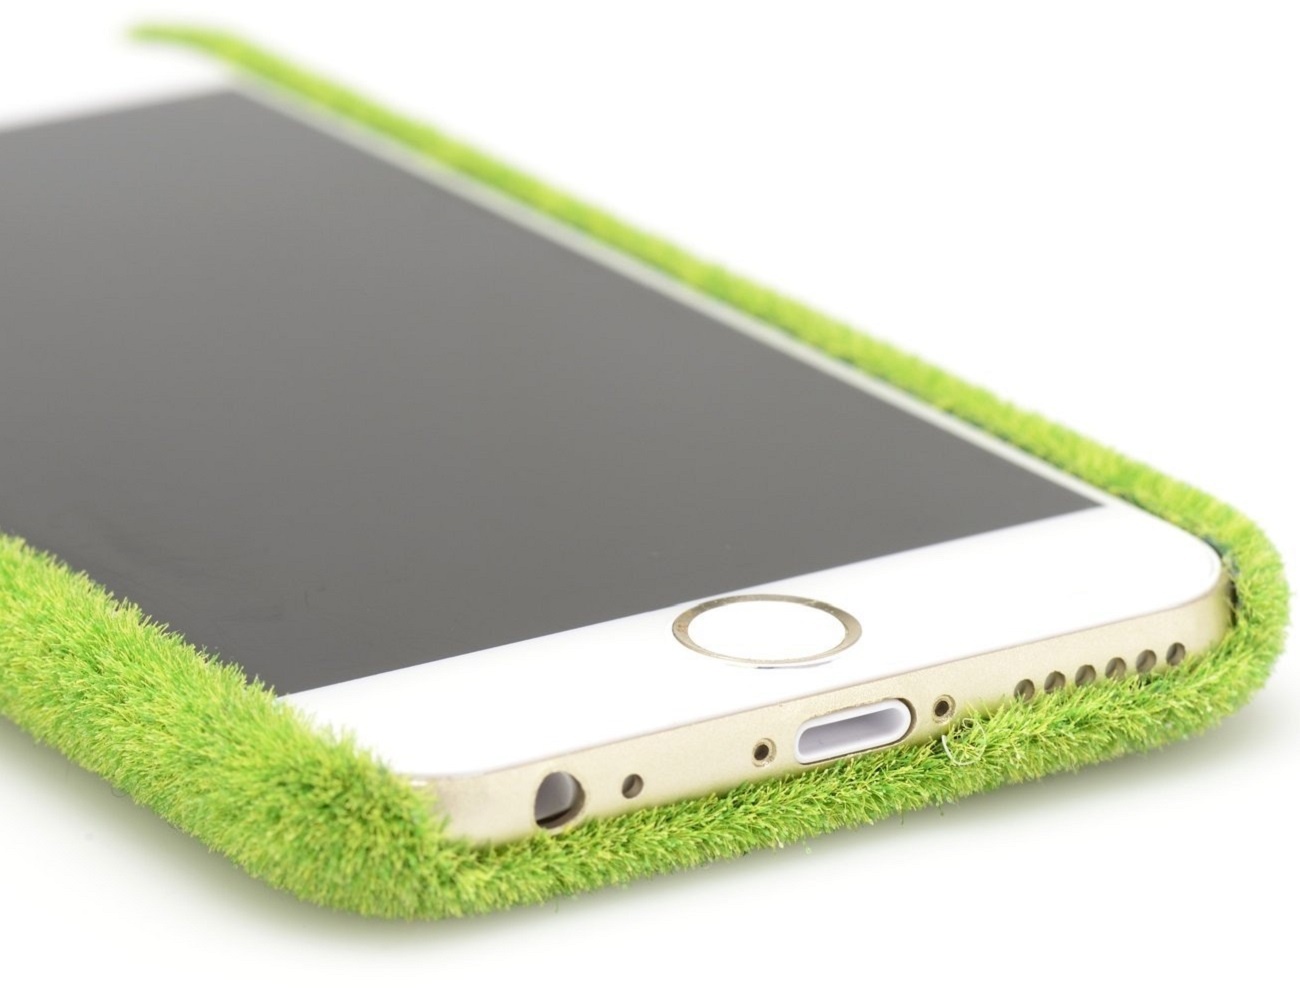 Shibaful Turf iPhone SE/5s Case